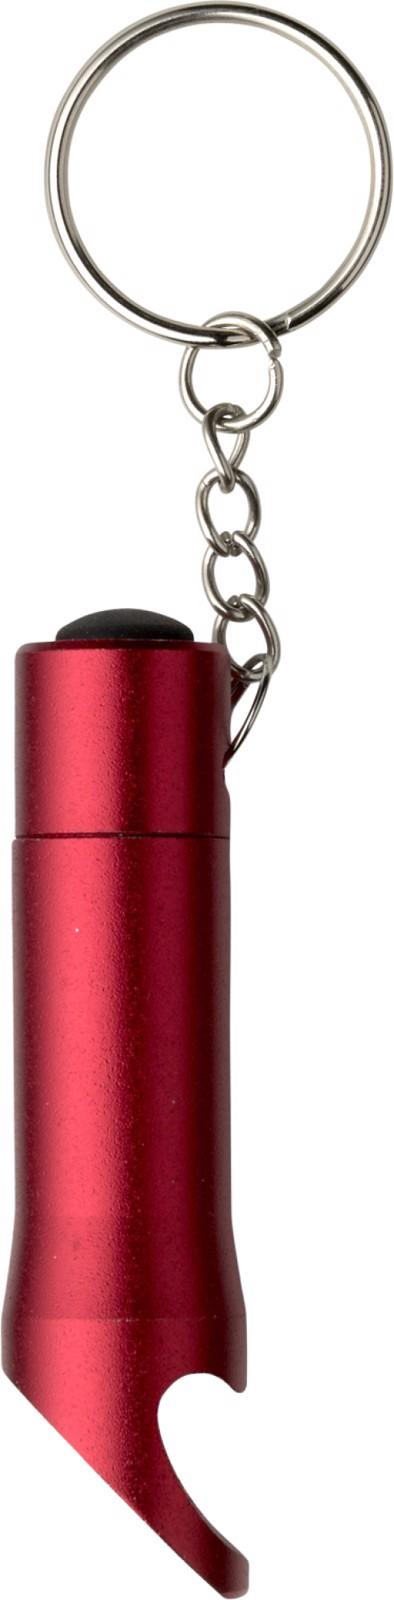 Aluminium 2-in-1 key holder - Red